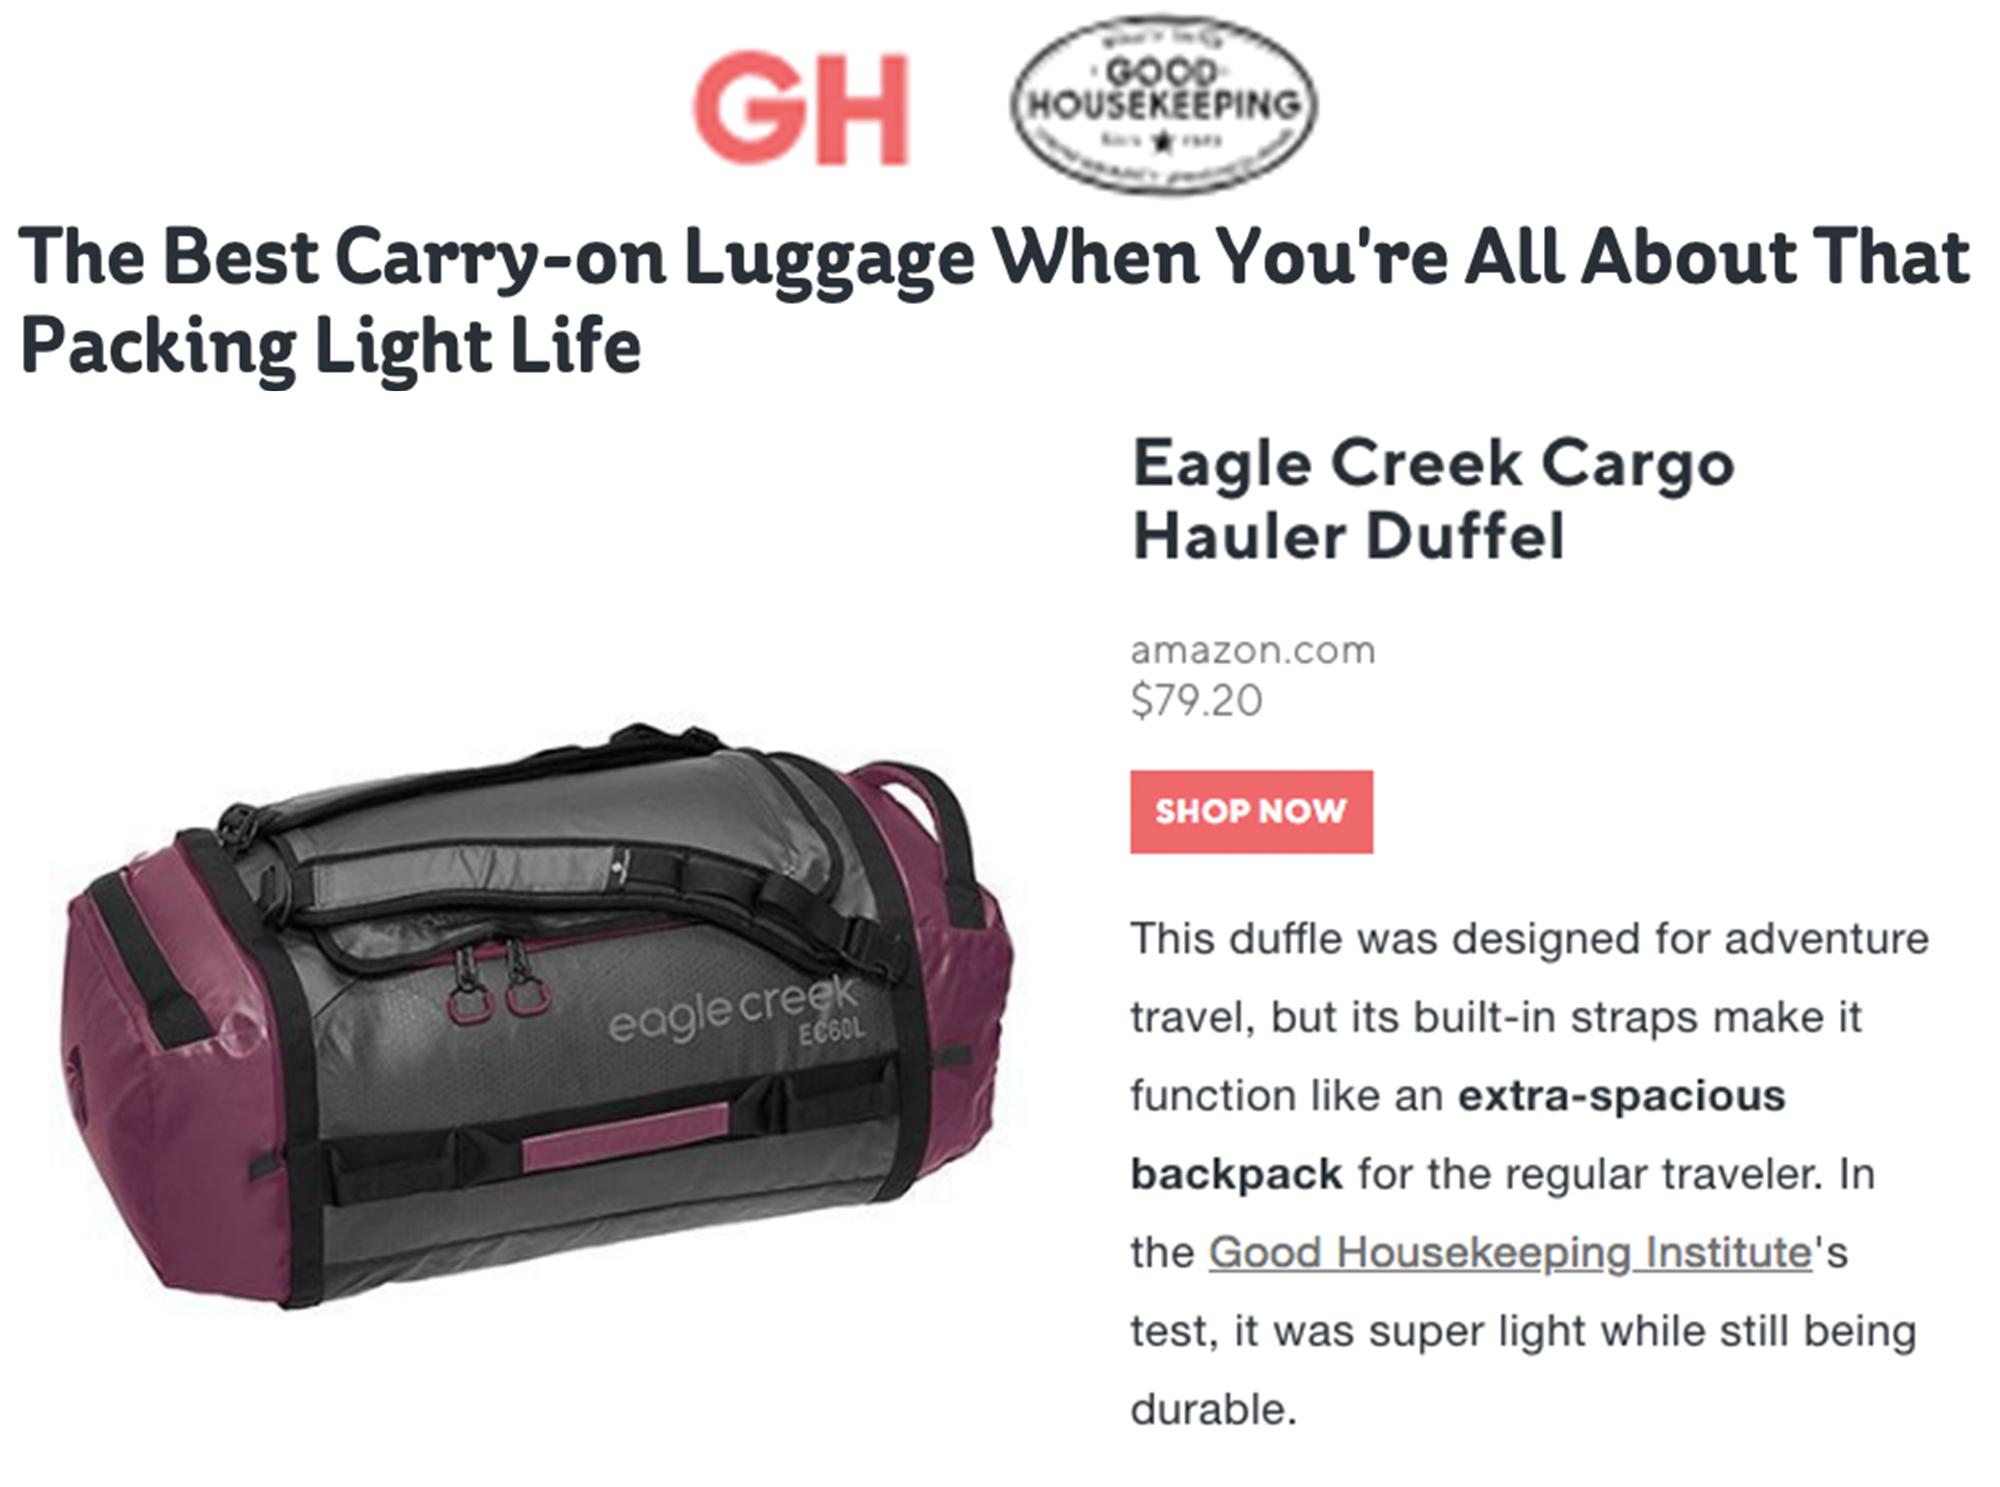 EC cargo hauler on GH 0418